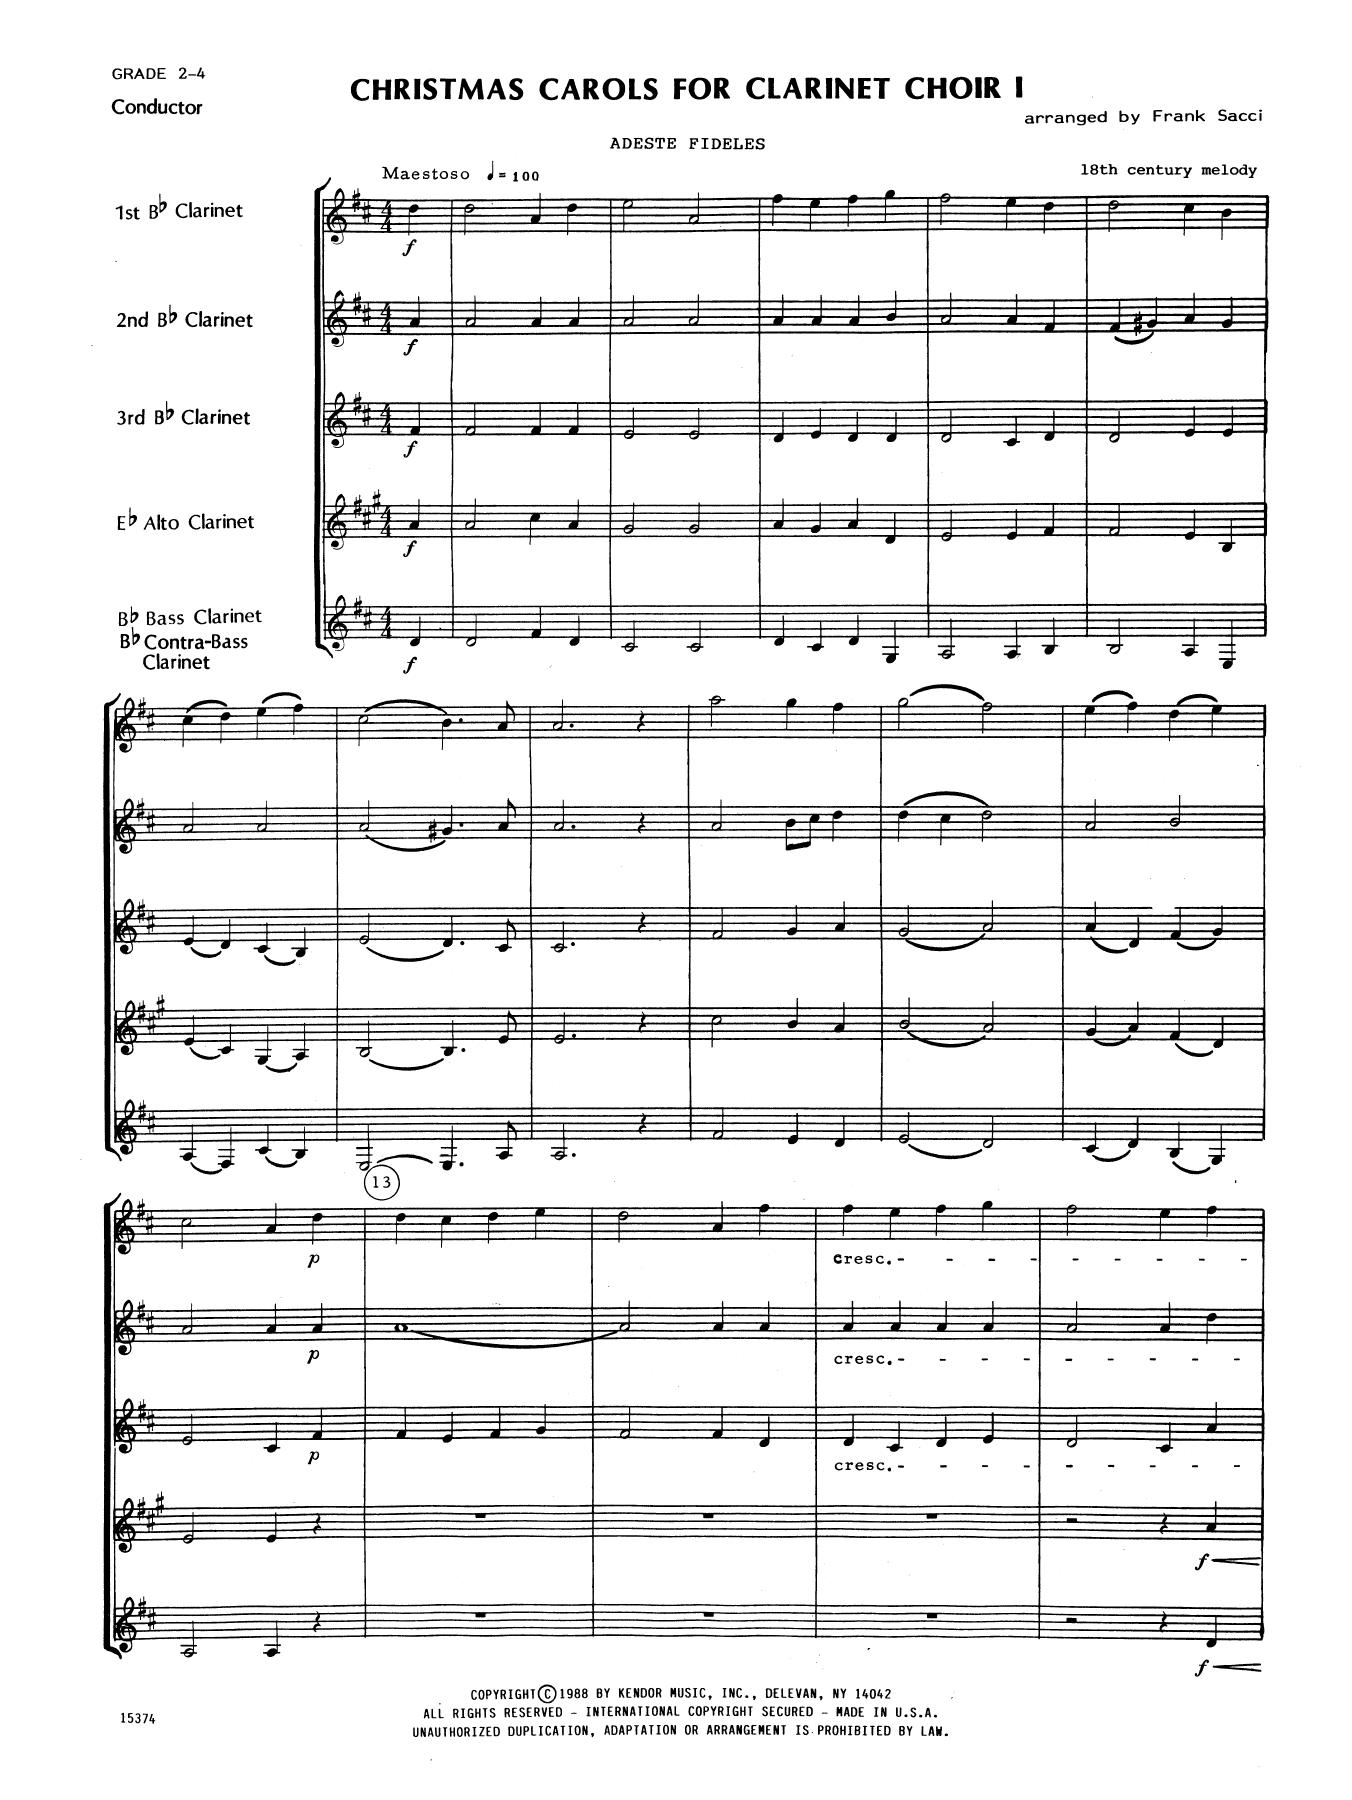 Christmas Carols Sheet Music.Christmas Carols For Clarinet Choir I Full Score By Frank Sacci Woodwind Ensemble Digital Sheet Music